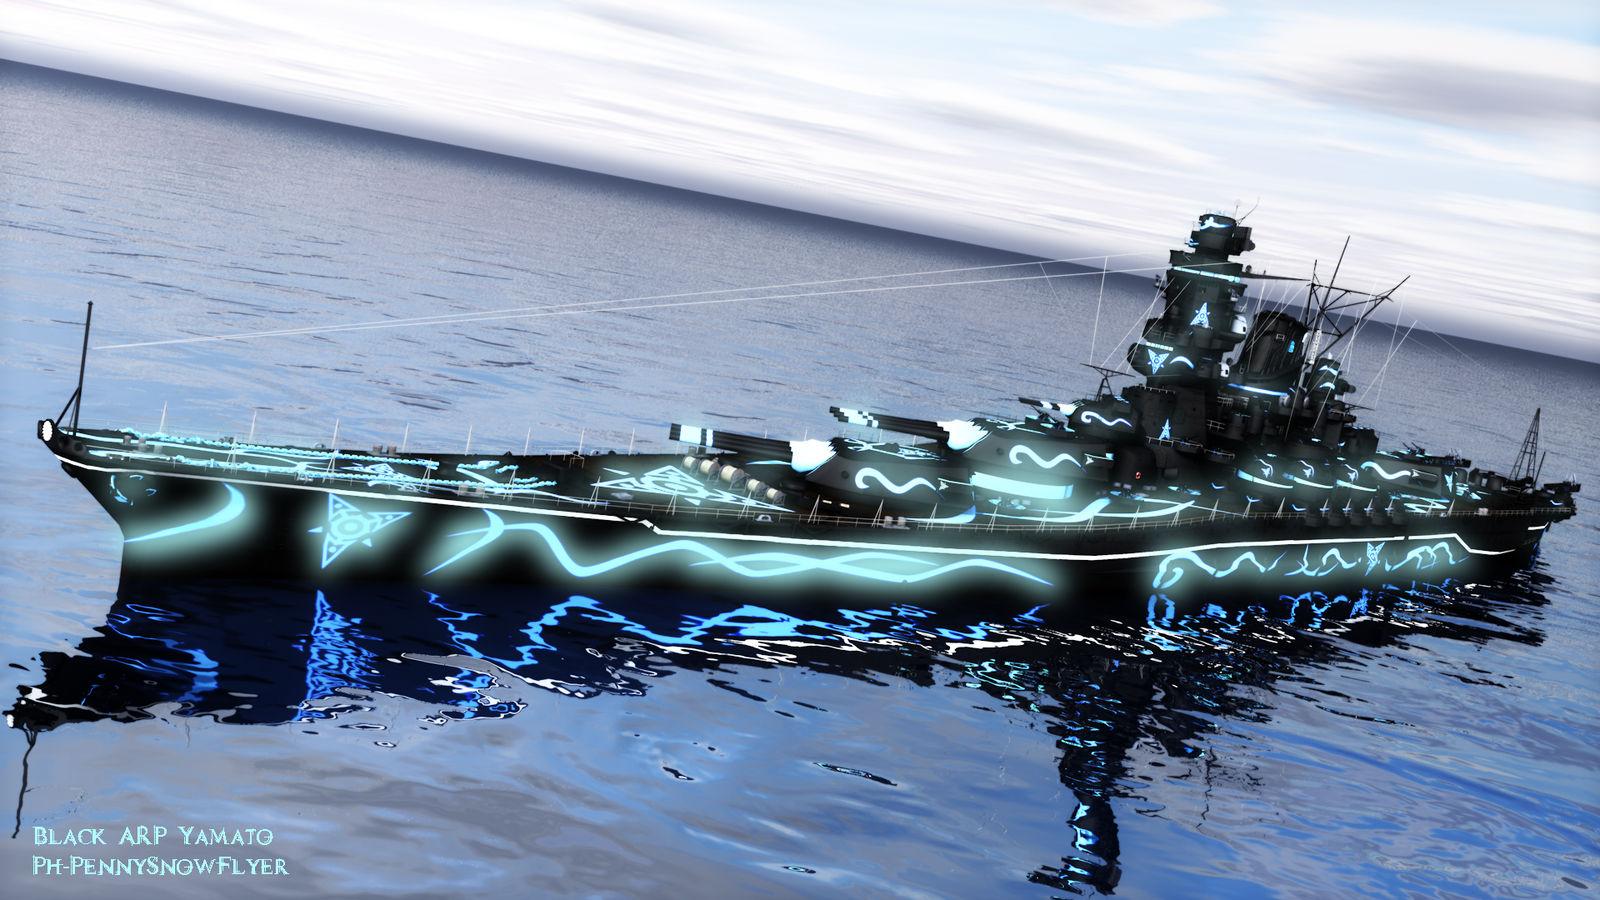 World of Warships: Black ARP Yamato by PH-PennySnowFlyer on